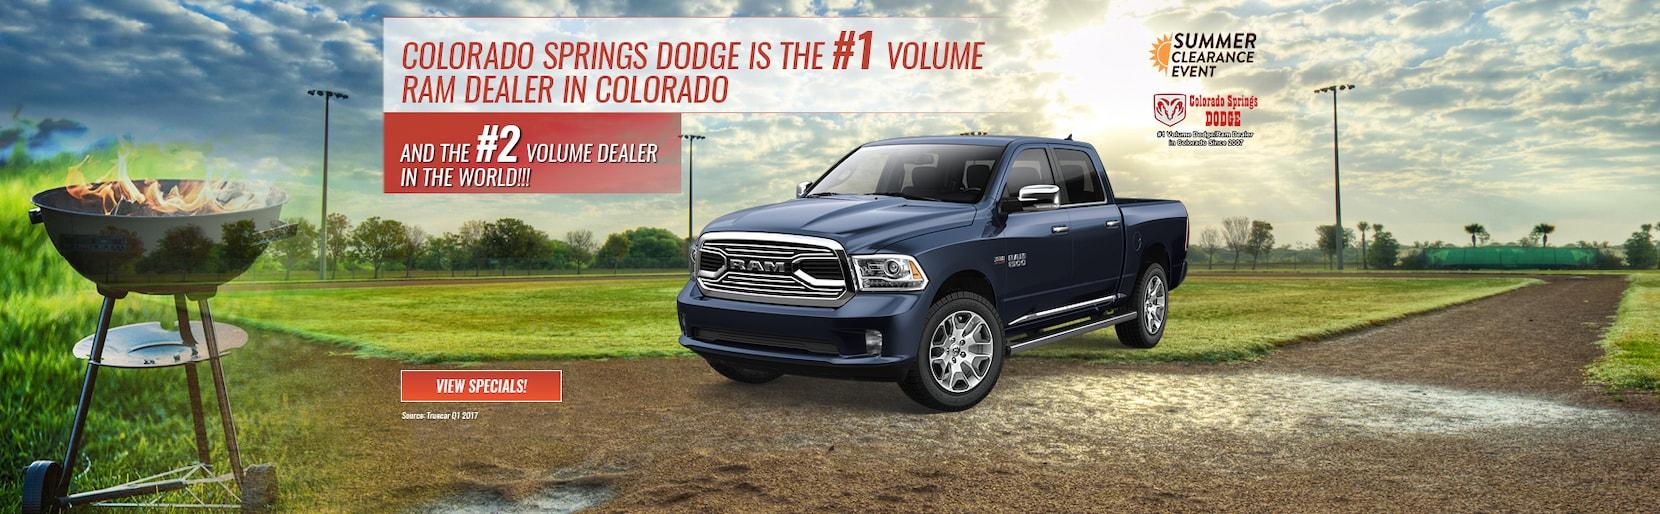 colorado springs dodge ram dealer car dealer fountain fort carson pueblo peyton calhan. Black Bedroom Furniture Sets. Home Design Ideas